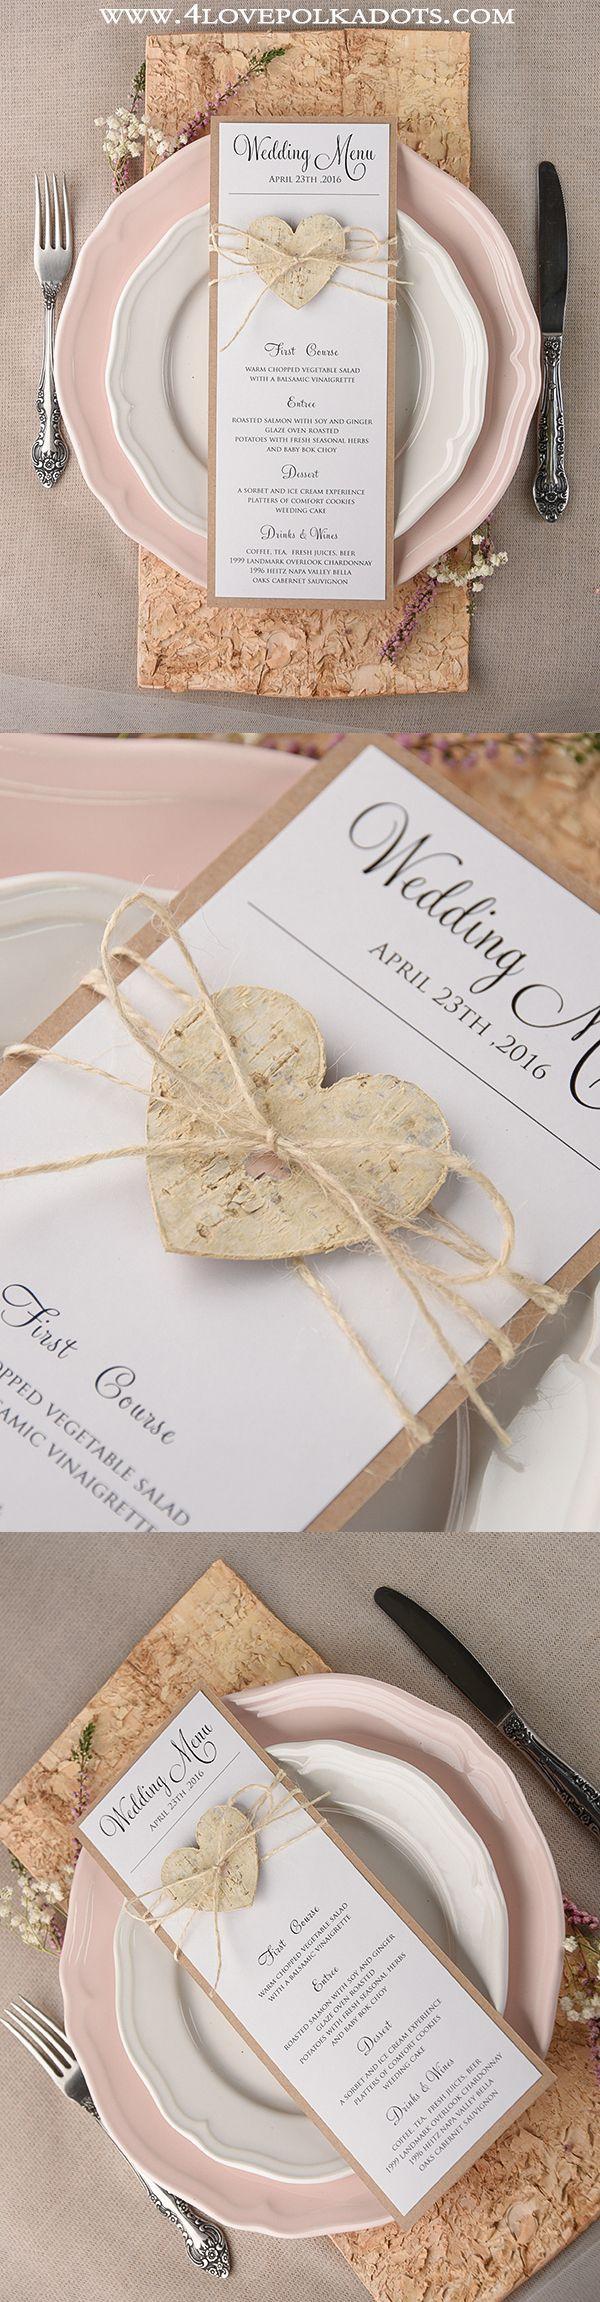 Rustic Wedding Menu #weddingideas #menucards